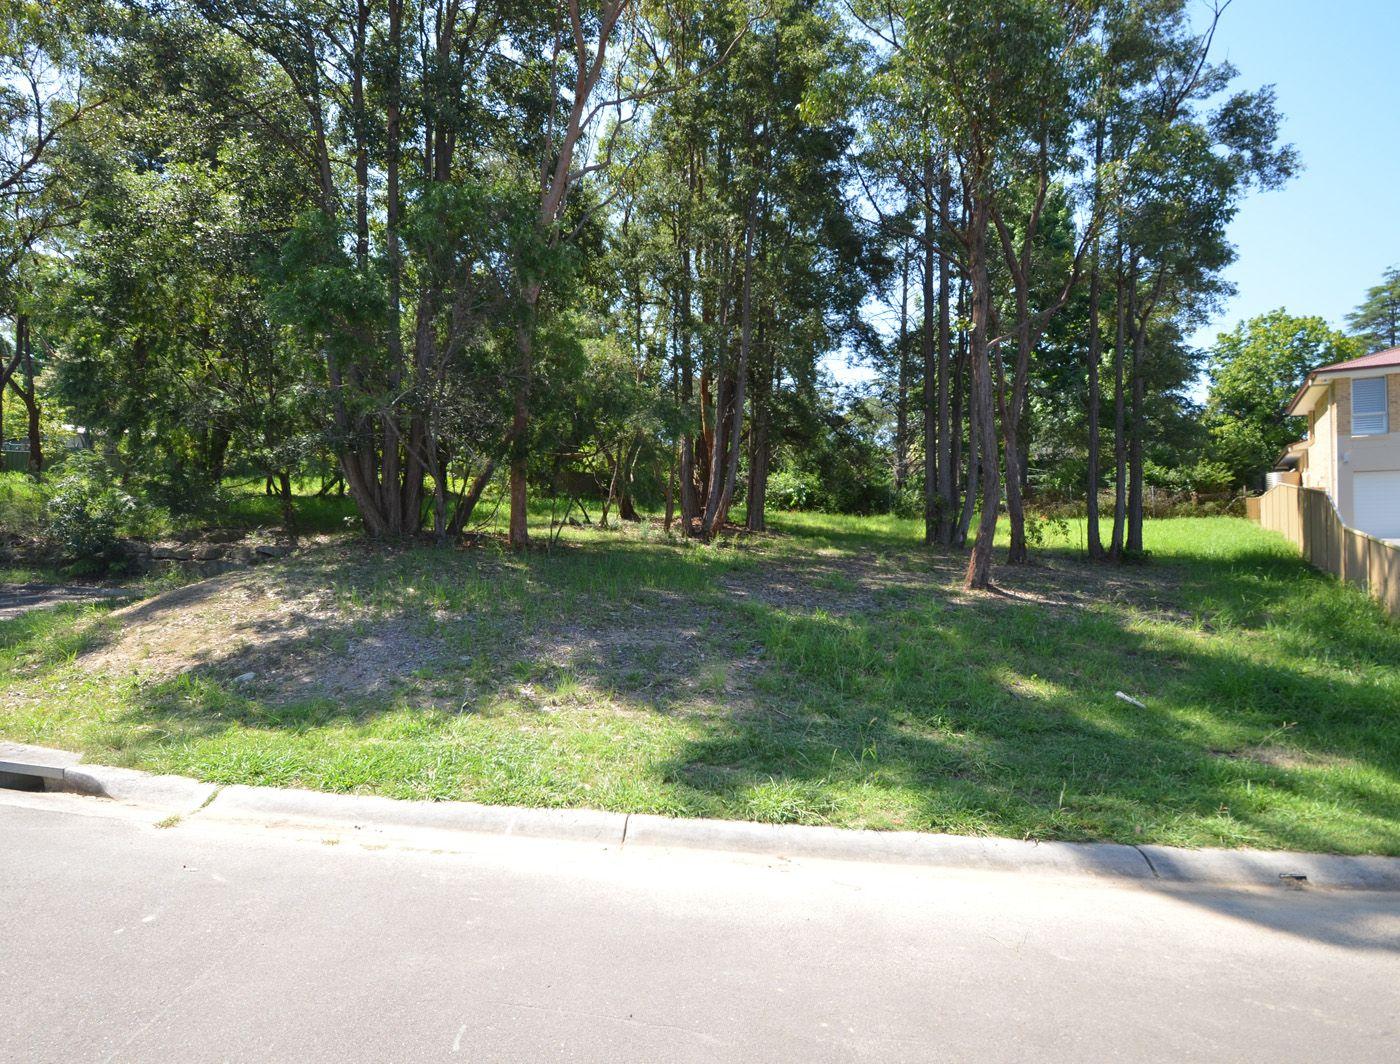 Lot 33/22 Moore Crescent, Faulconbridge NSW 2776, Image 0